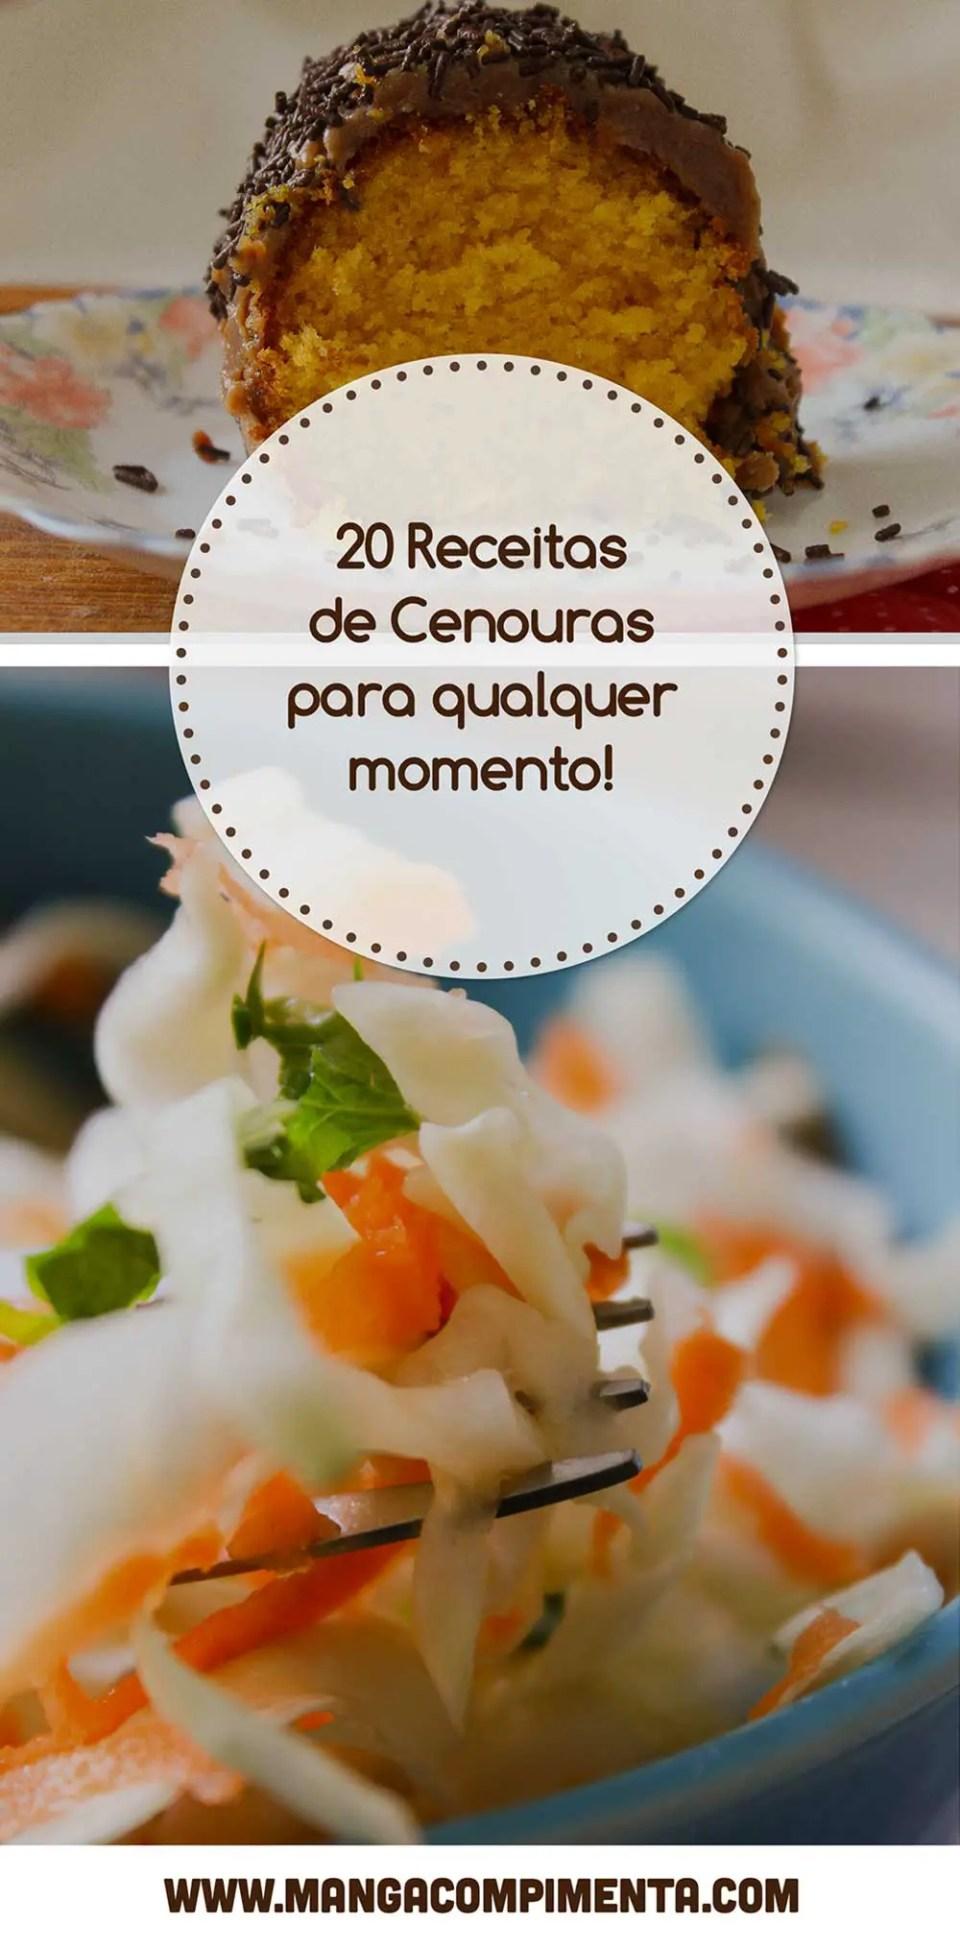 Confira as 20 Receitas de Cenouras para qualquer momento aí na sua casa!